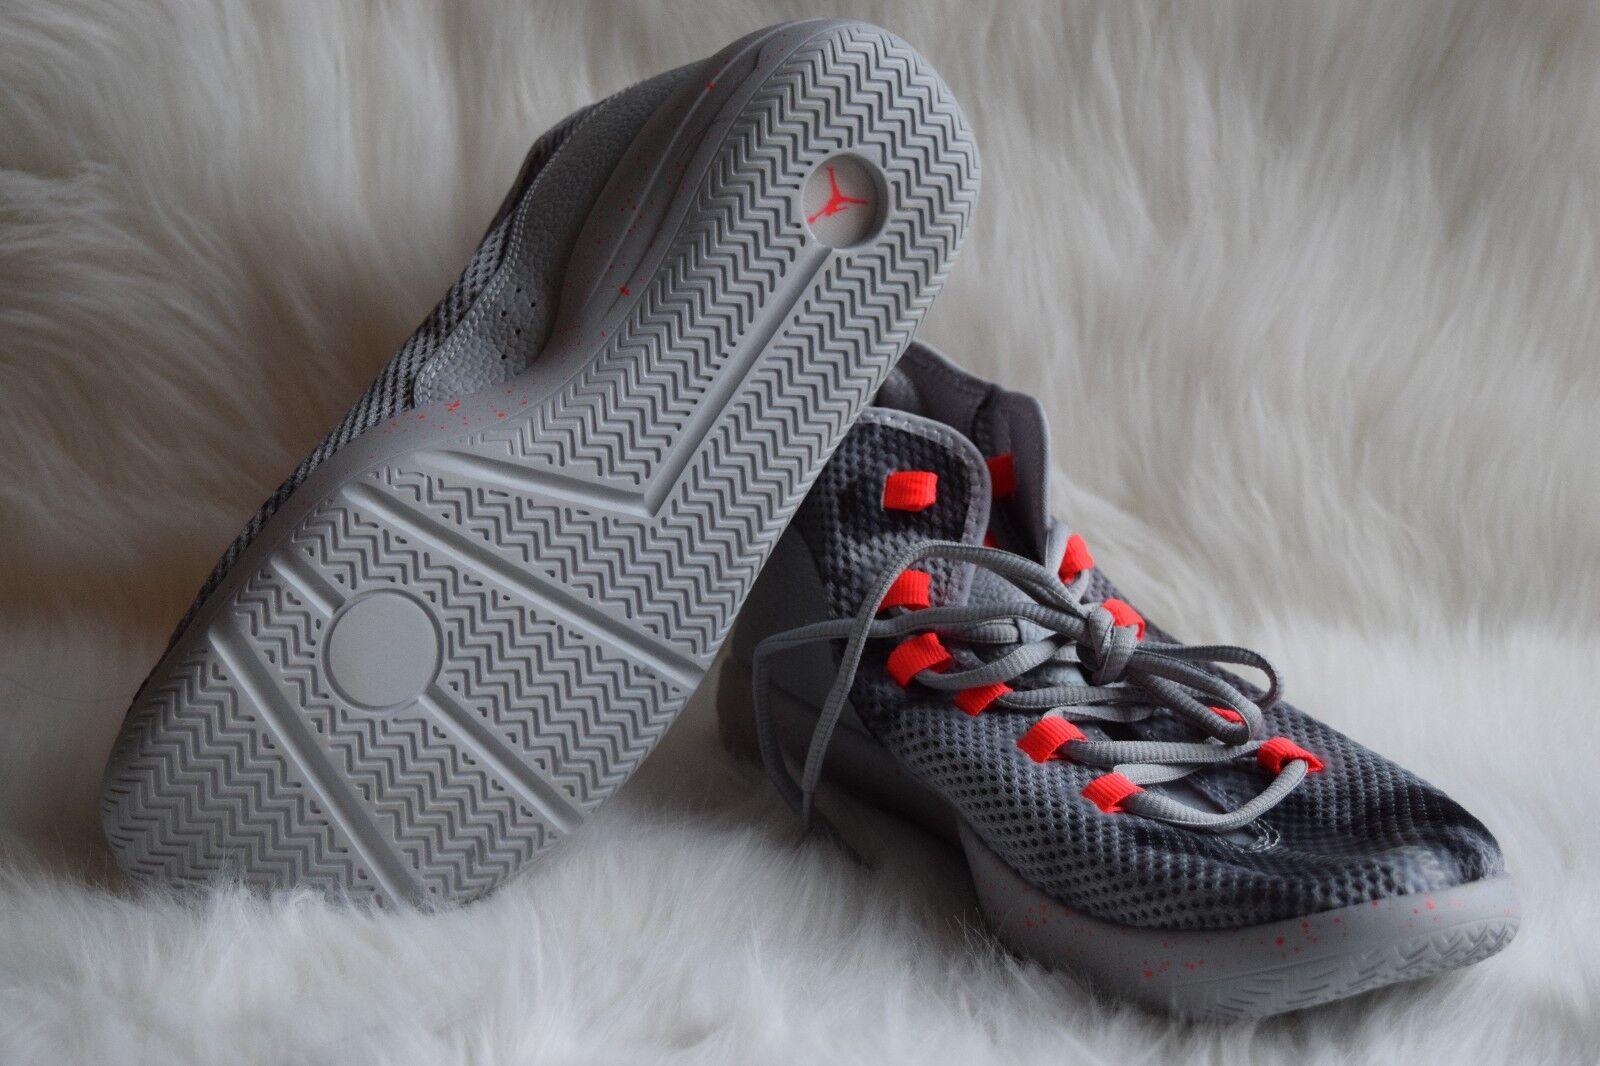 Nike Men's Jordan Reveal Premium Wolf Grey/Infrared 23/Black 834229-015 Sz 11